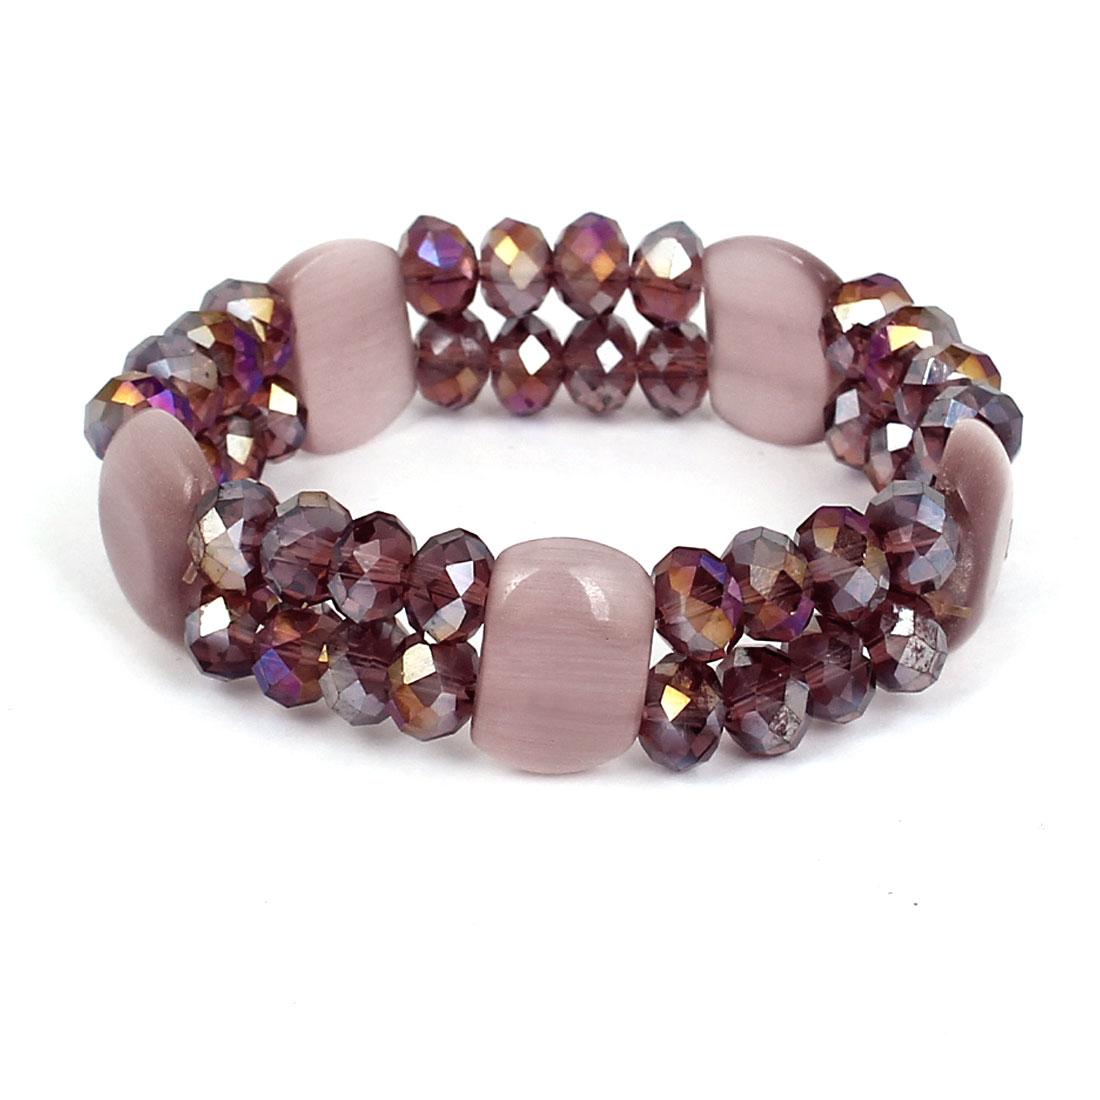 Woman Faux Crystal Decor Round Square Bead Linked Elastic Bangle Bracelet Pink